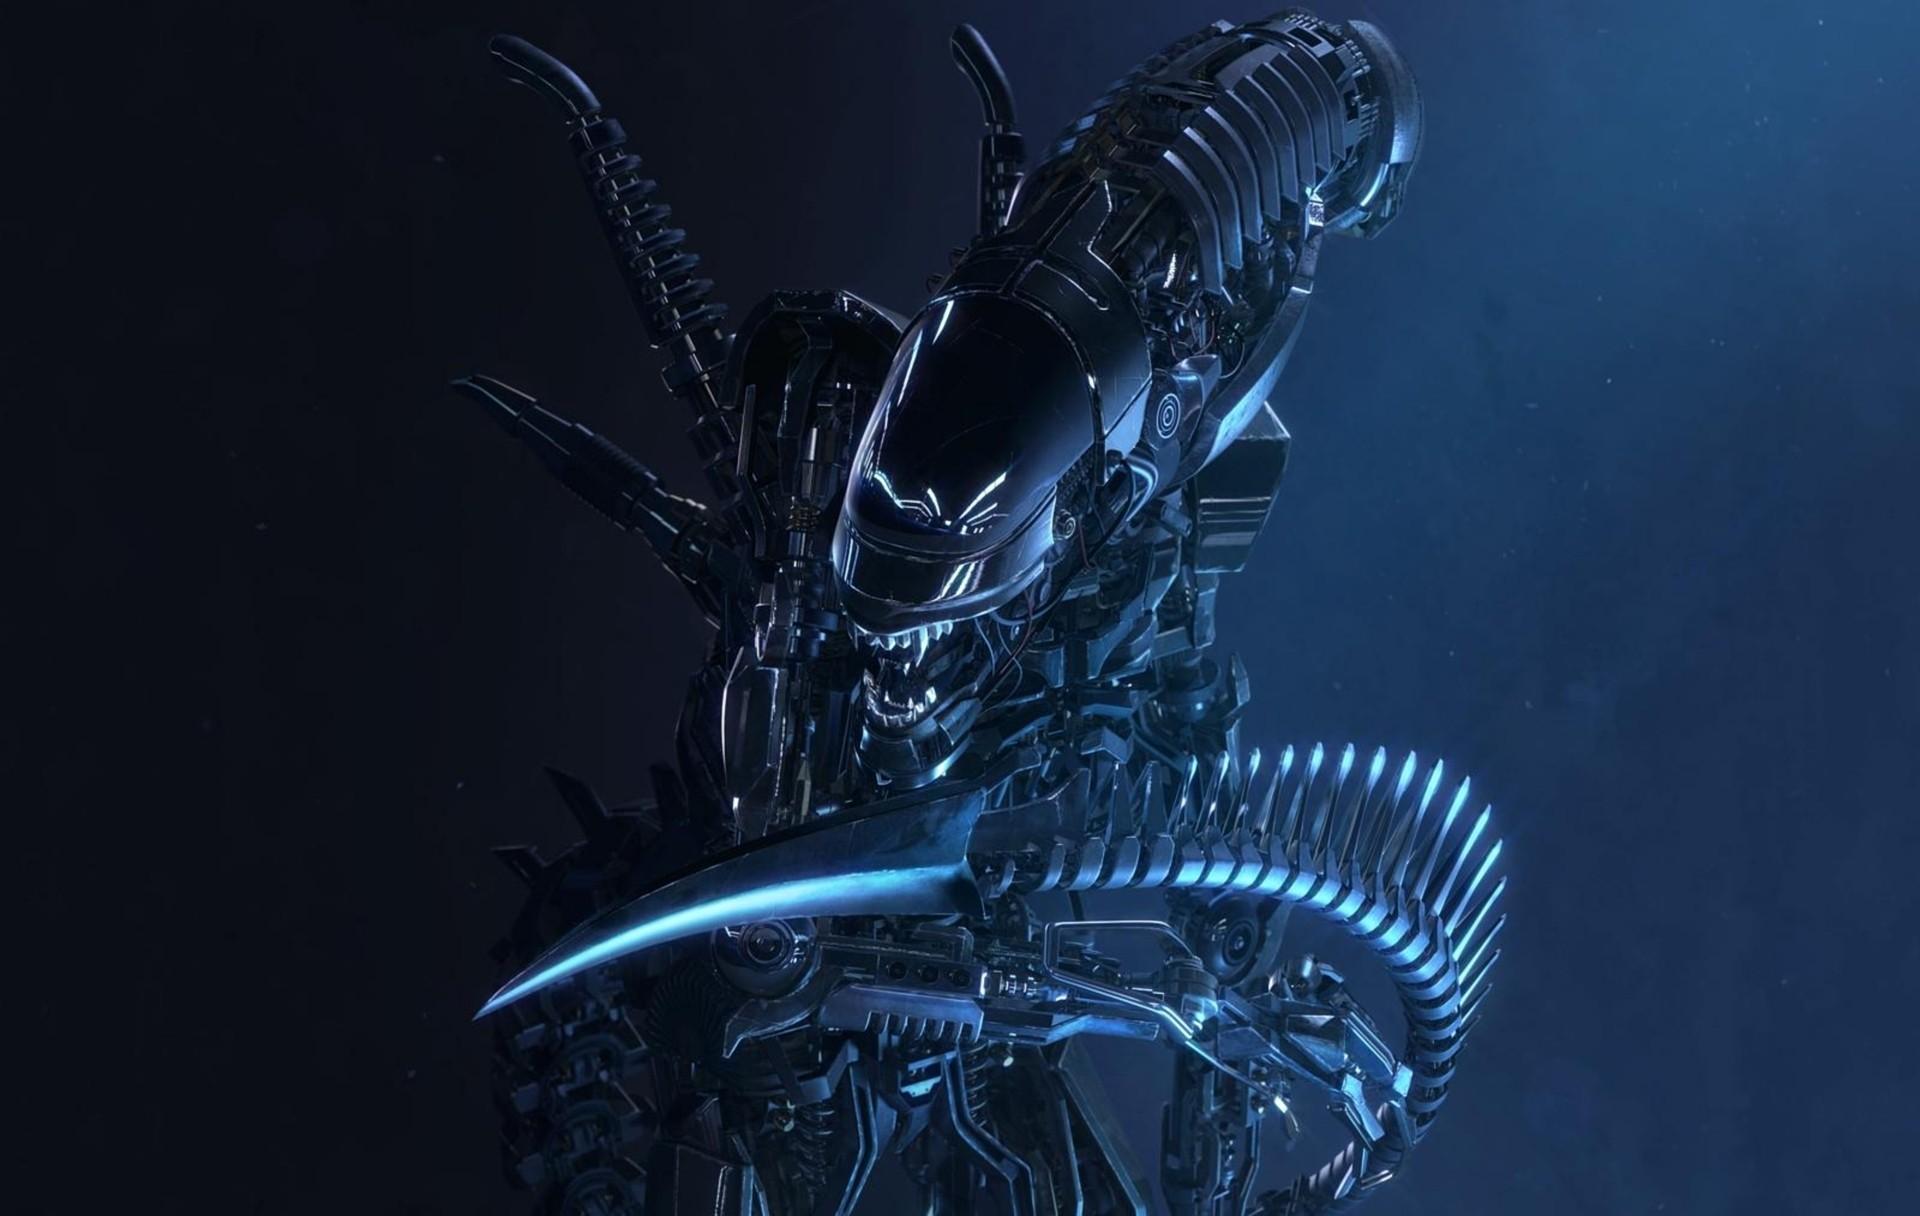 Ufo extraterrestrials piratebay fucking toons